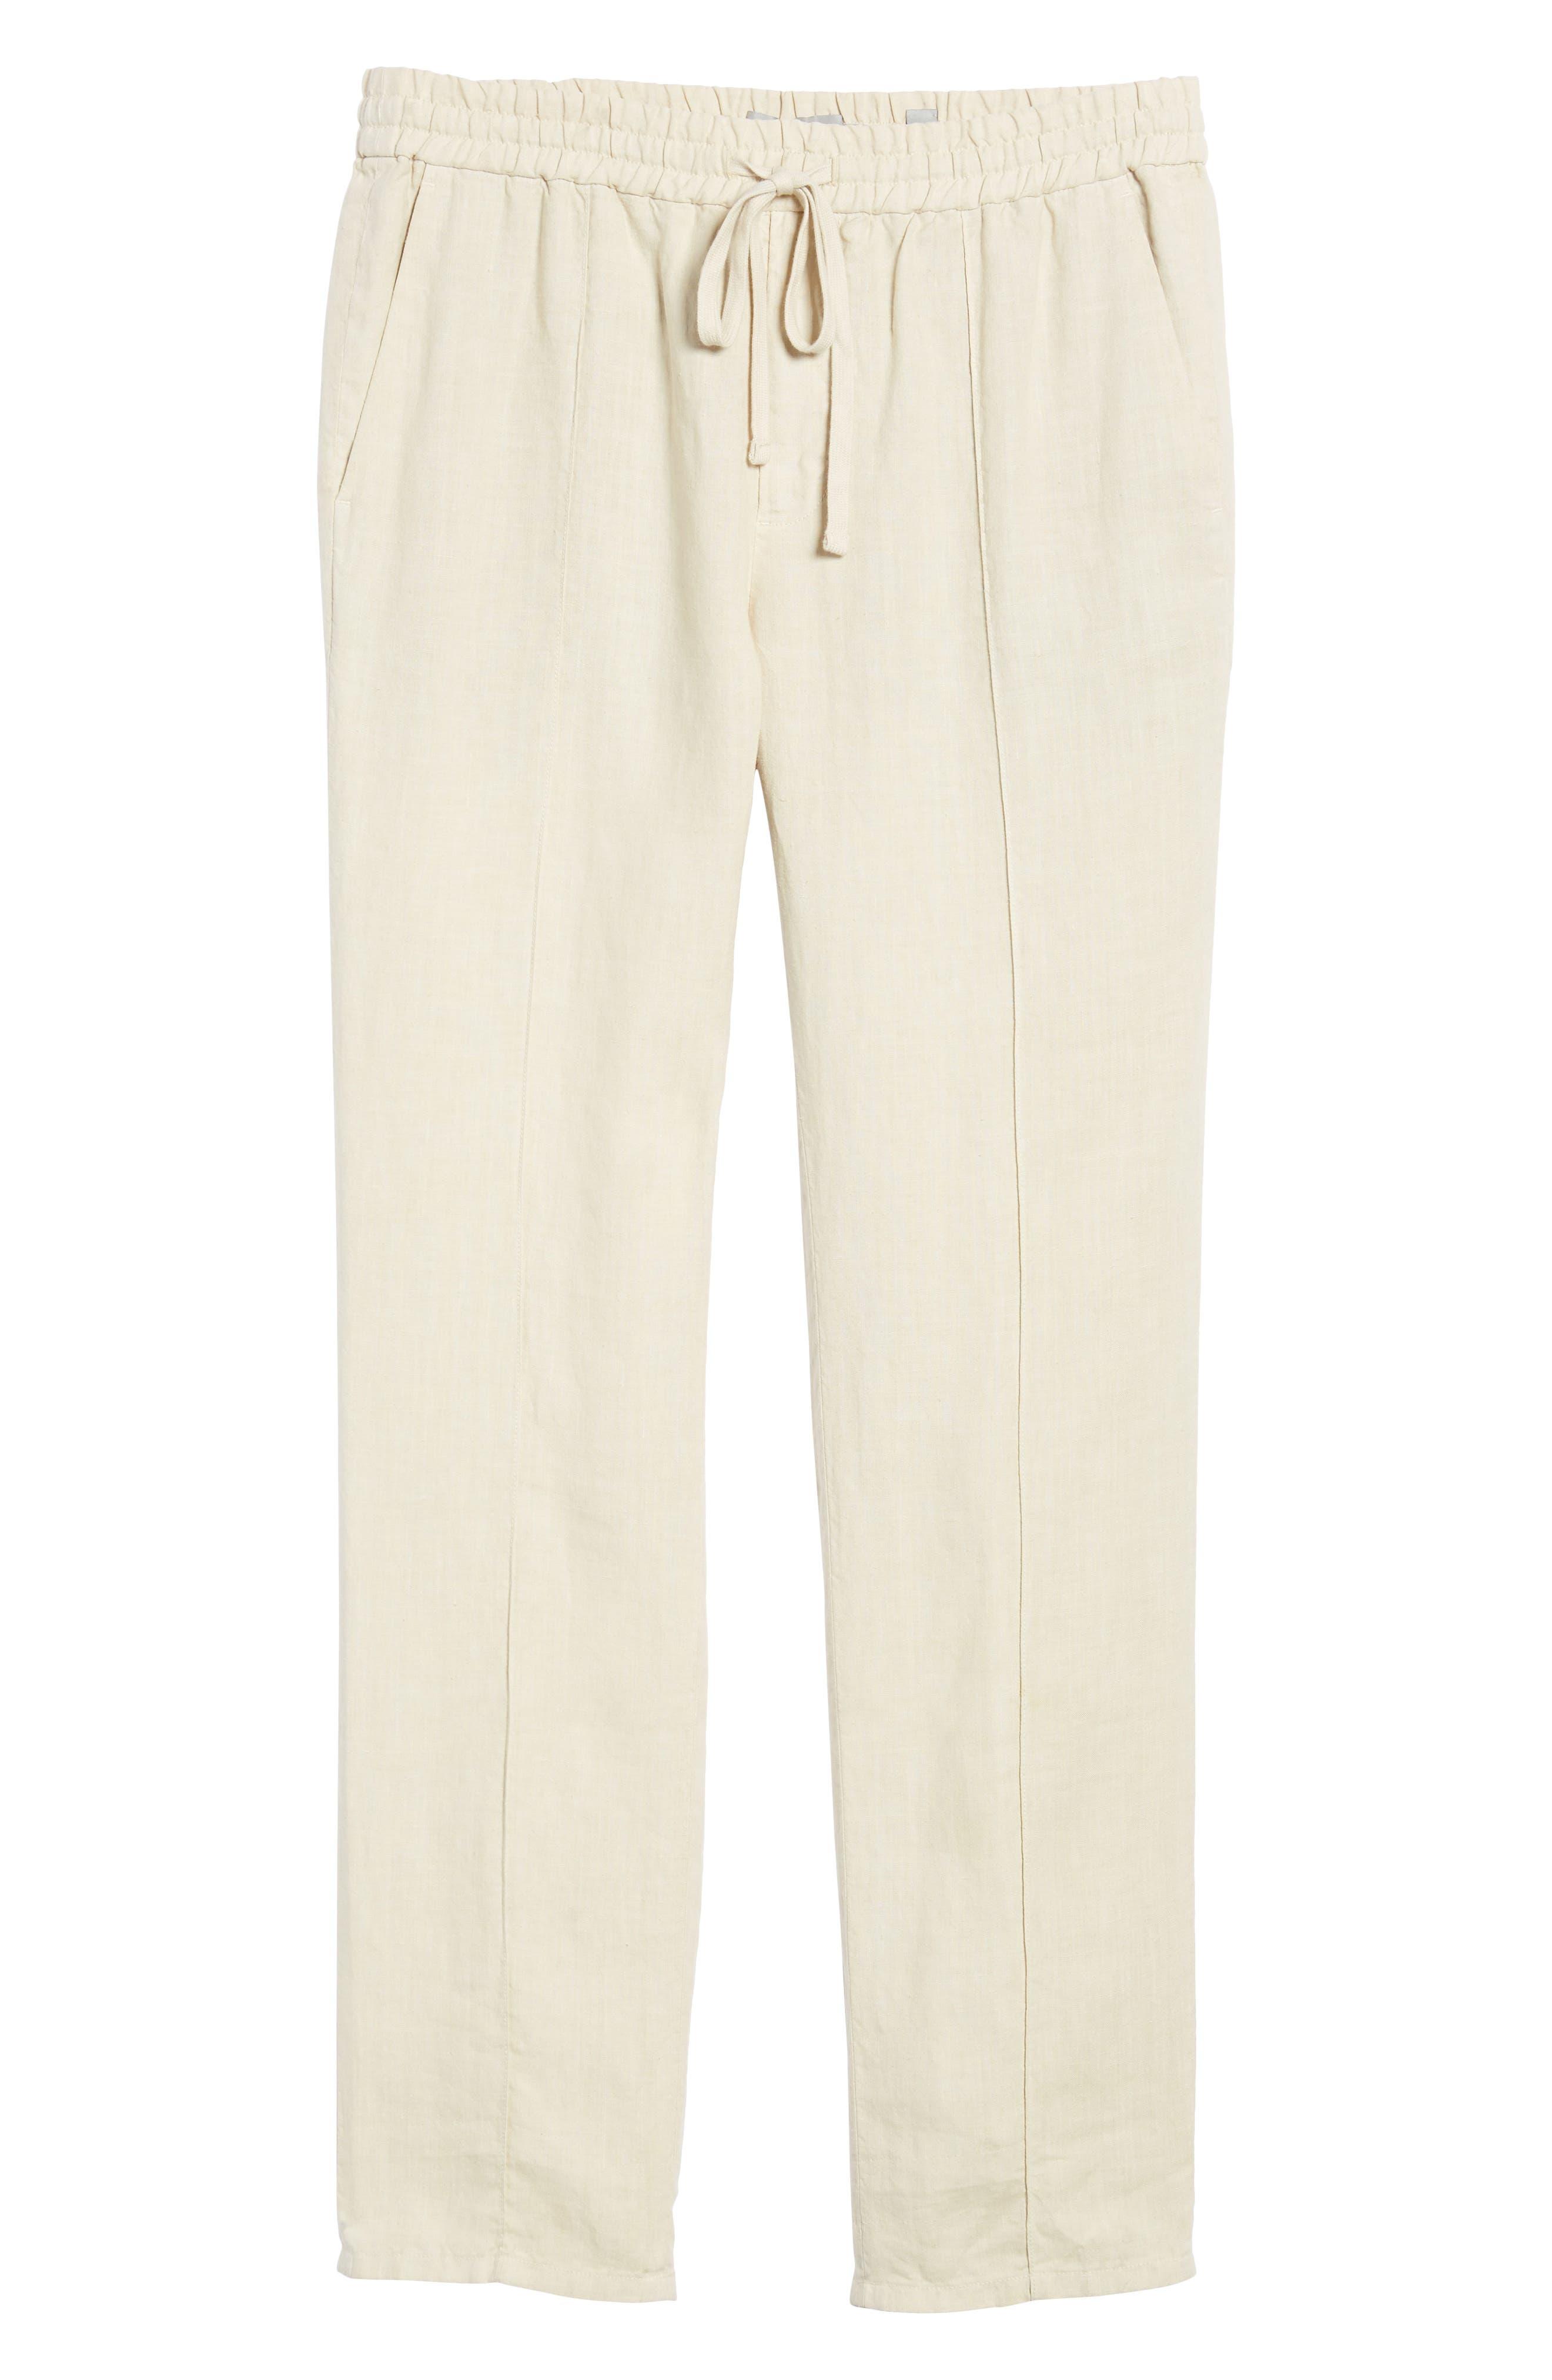 Pintuck Slim Fit Hemp Track Pants,                             Alternate thumbnail 6, color,                             WHITE SAND